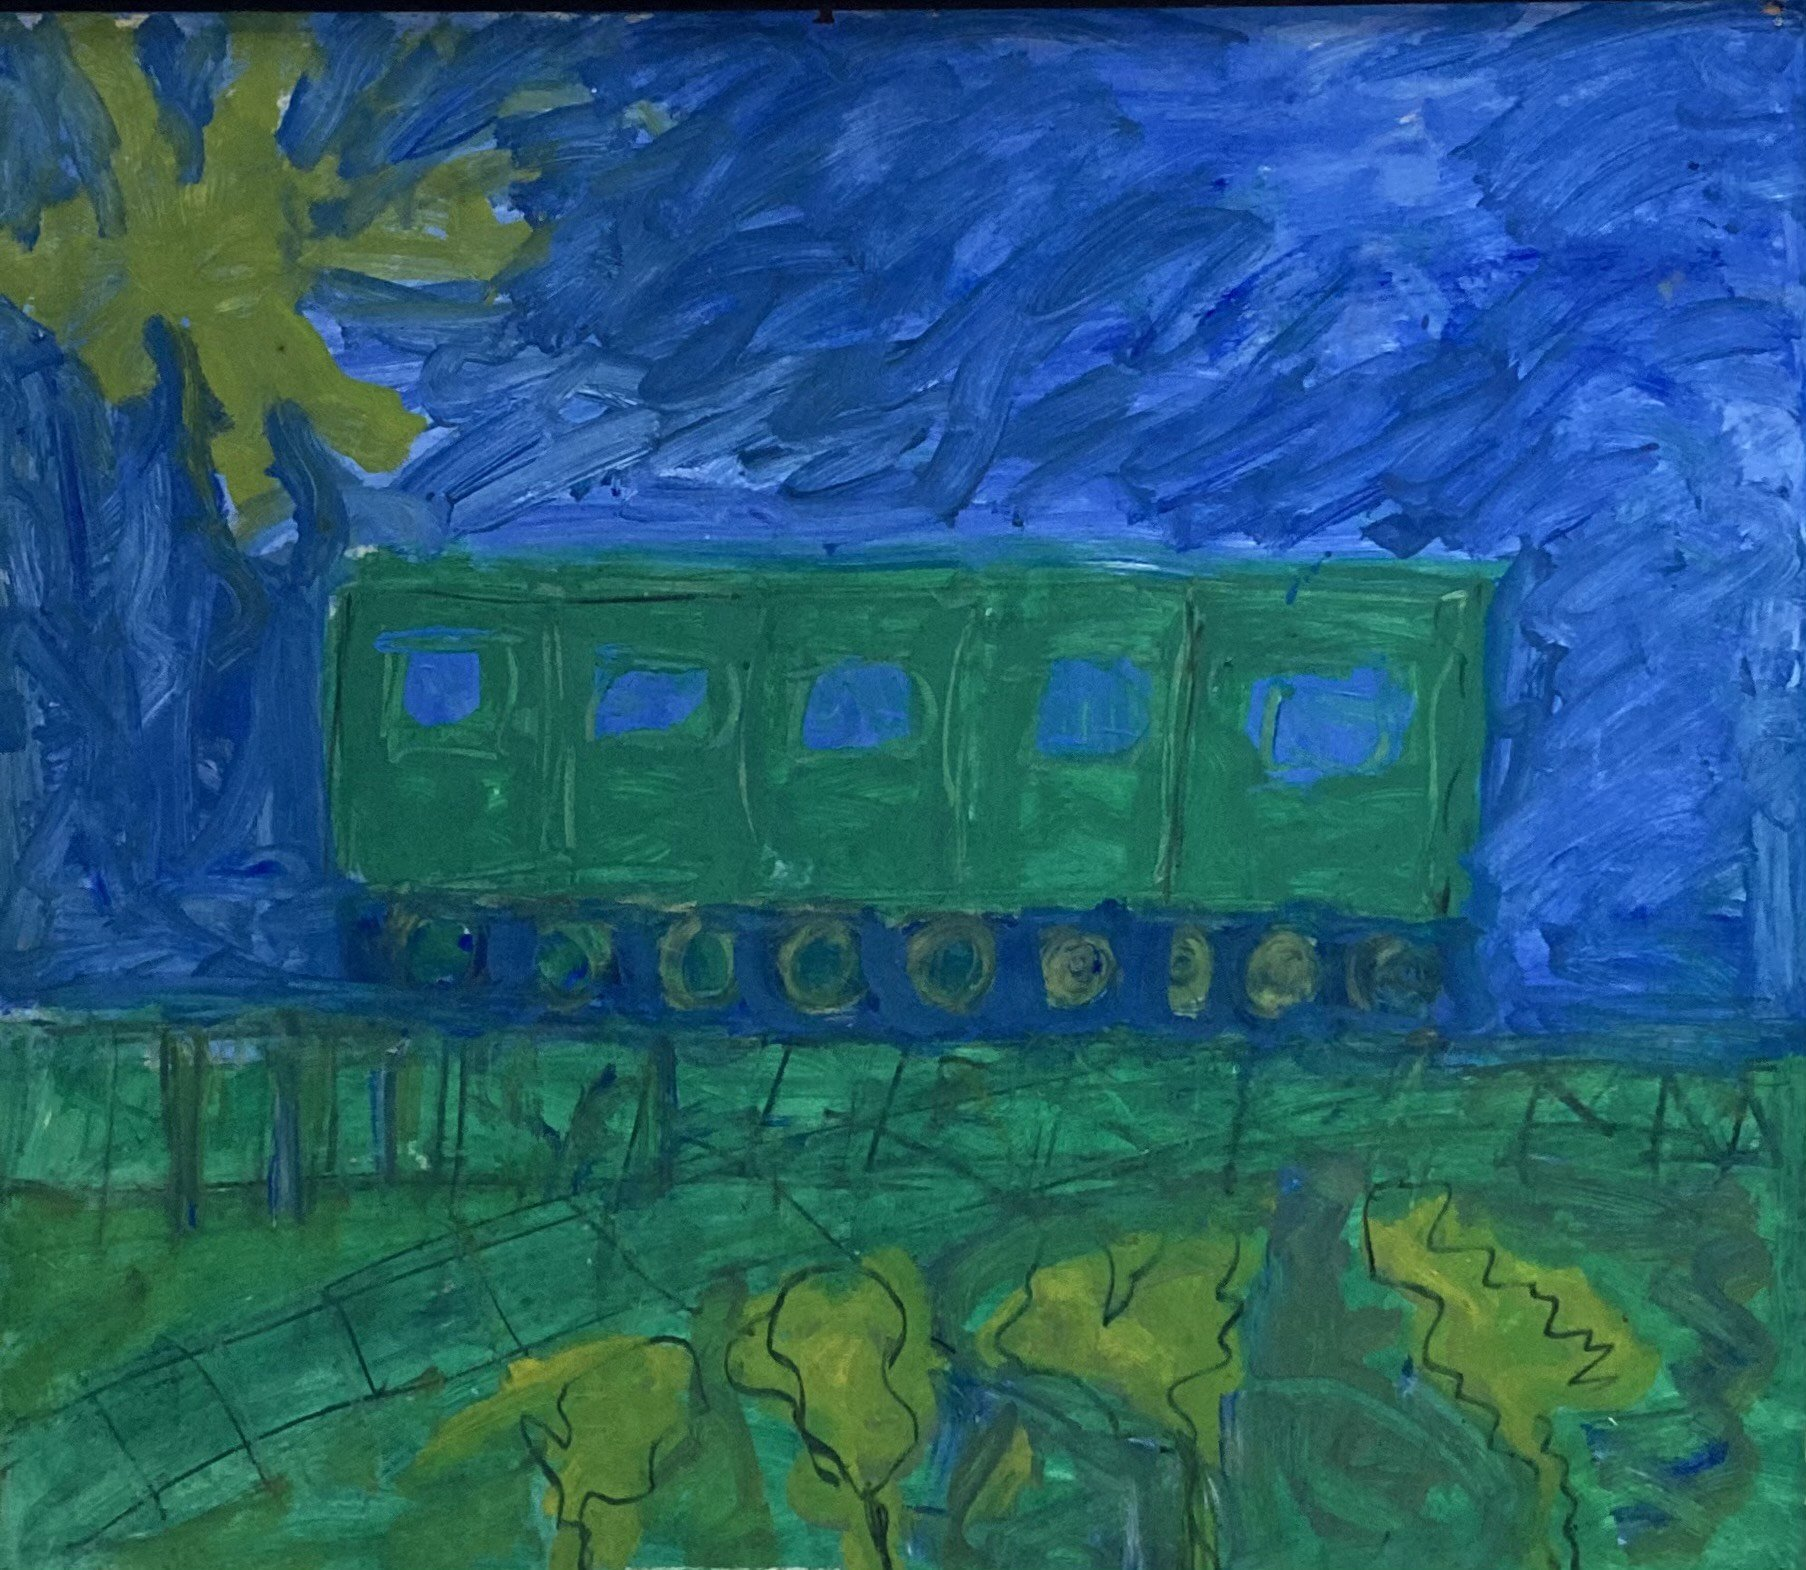 Train_John D Edwards